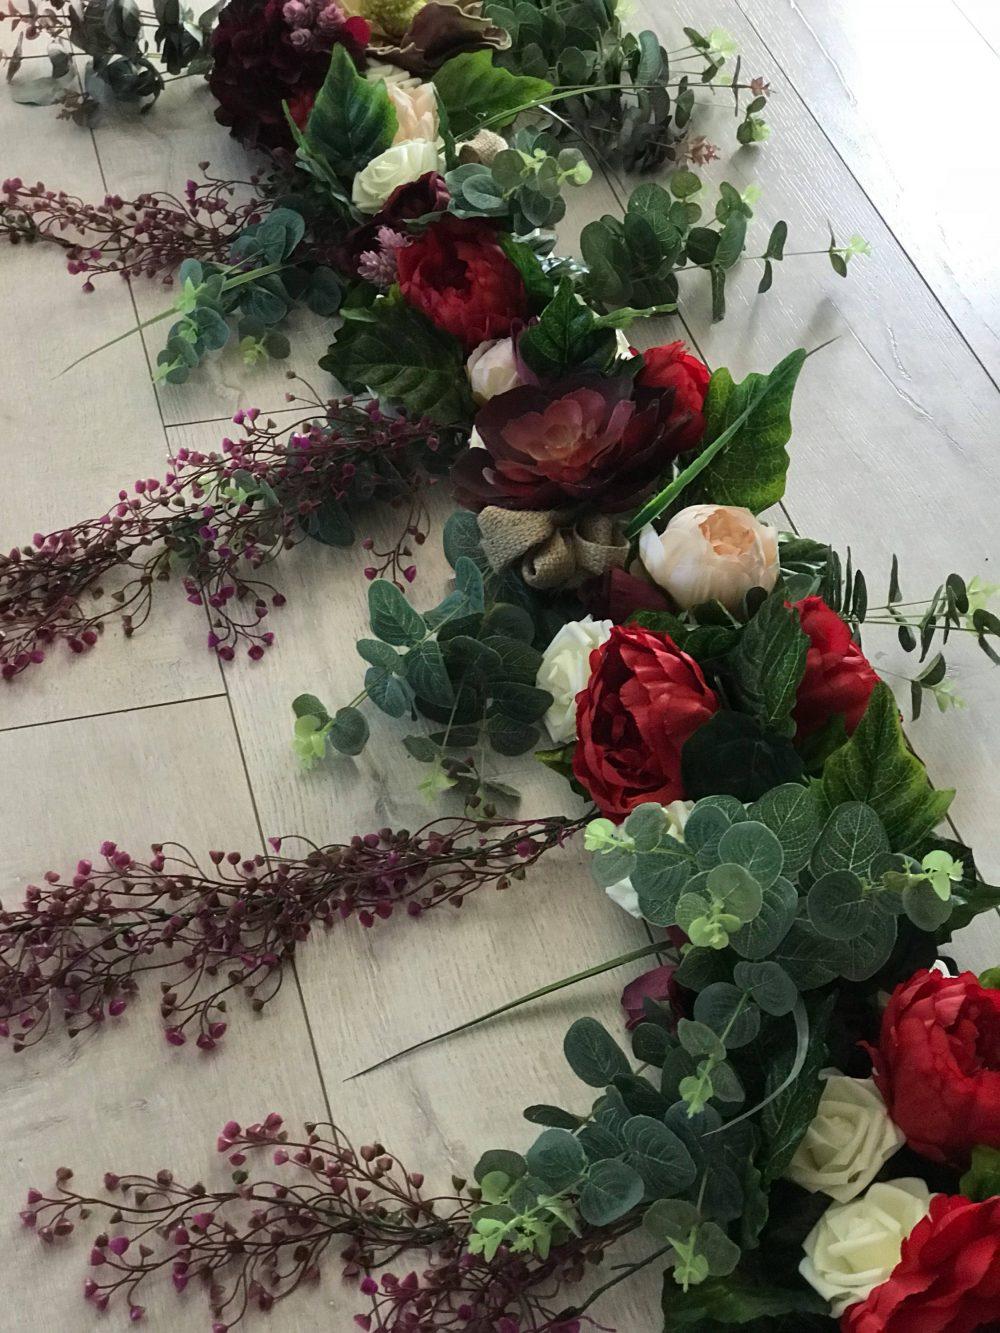 Arbour, Arch Or Garden Floral Arrangement... A Straight 2 Metres